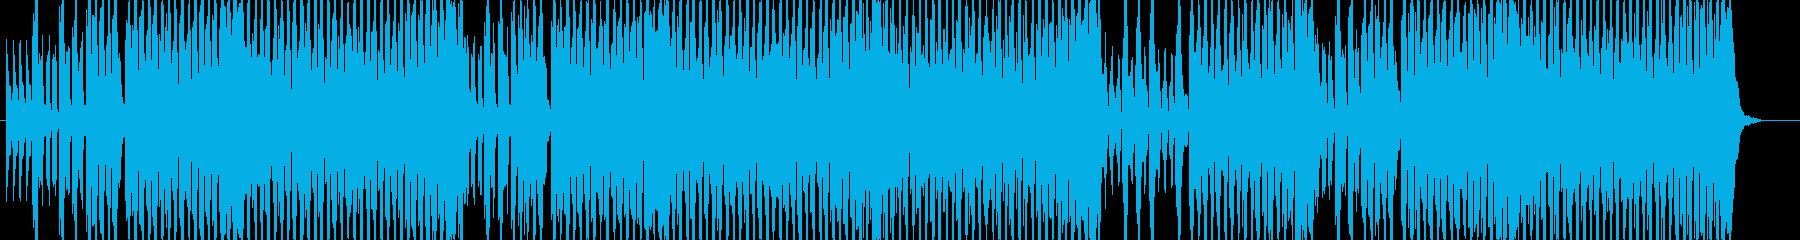 EDM版 アルプス一万尺の再生済みの波形